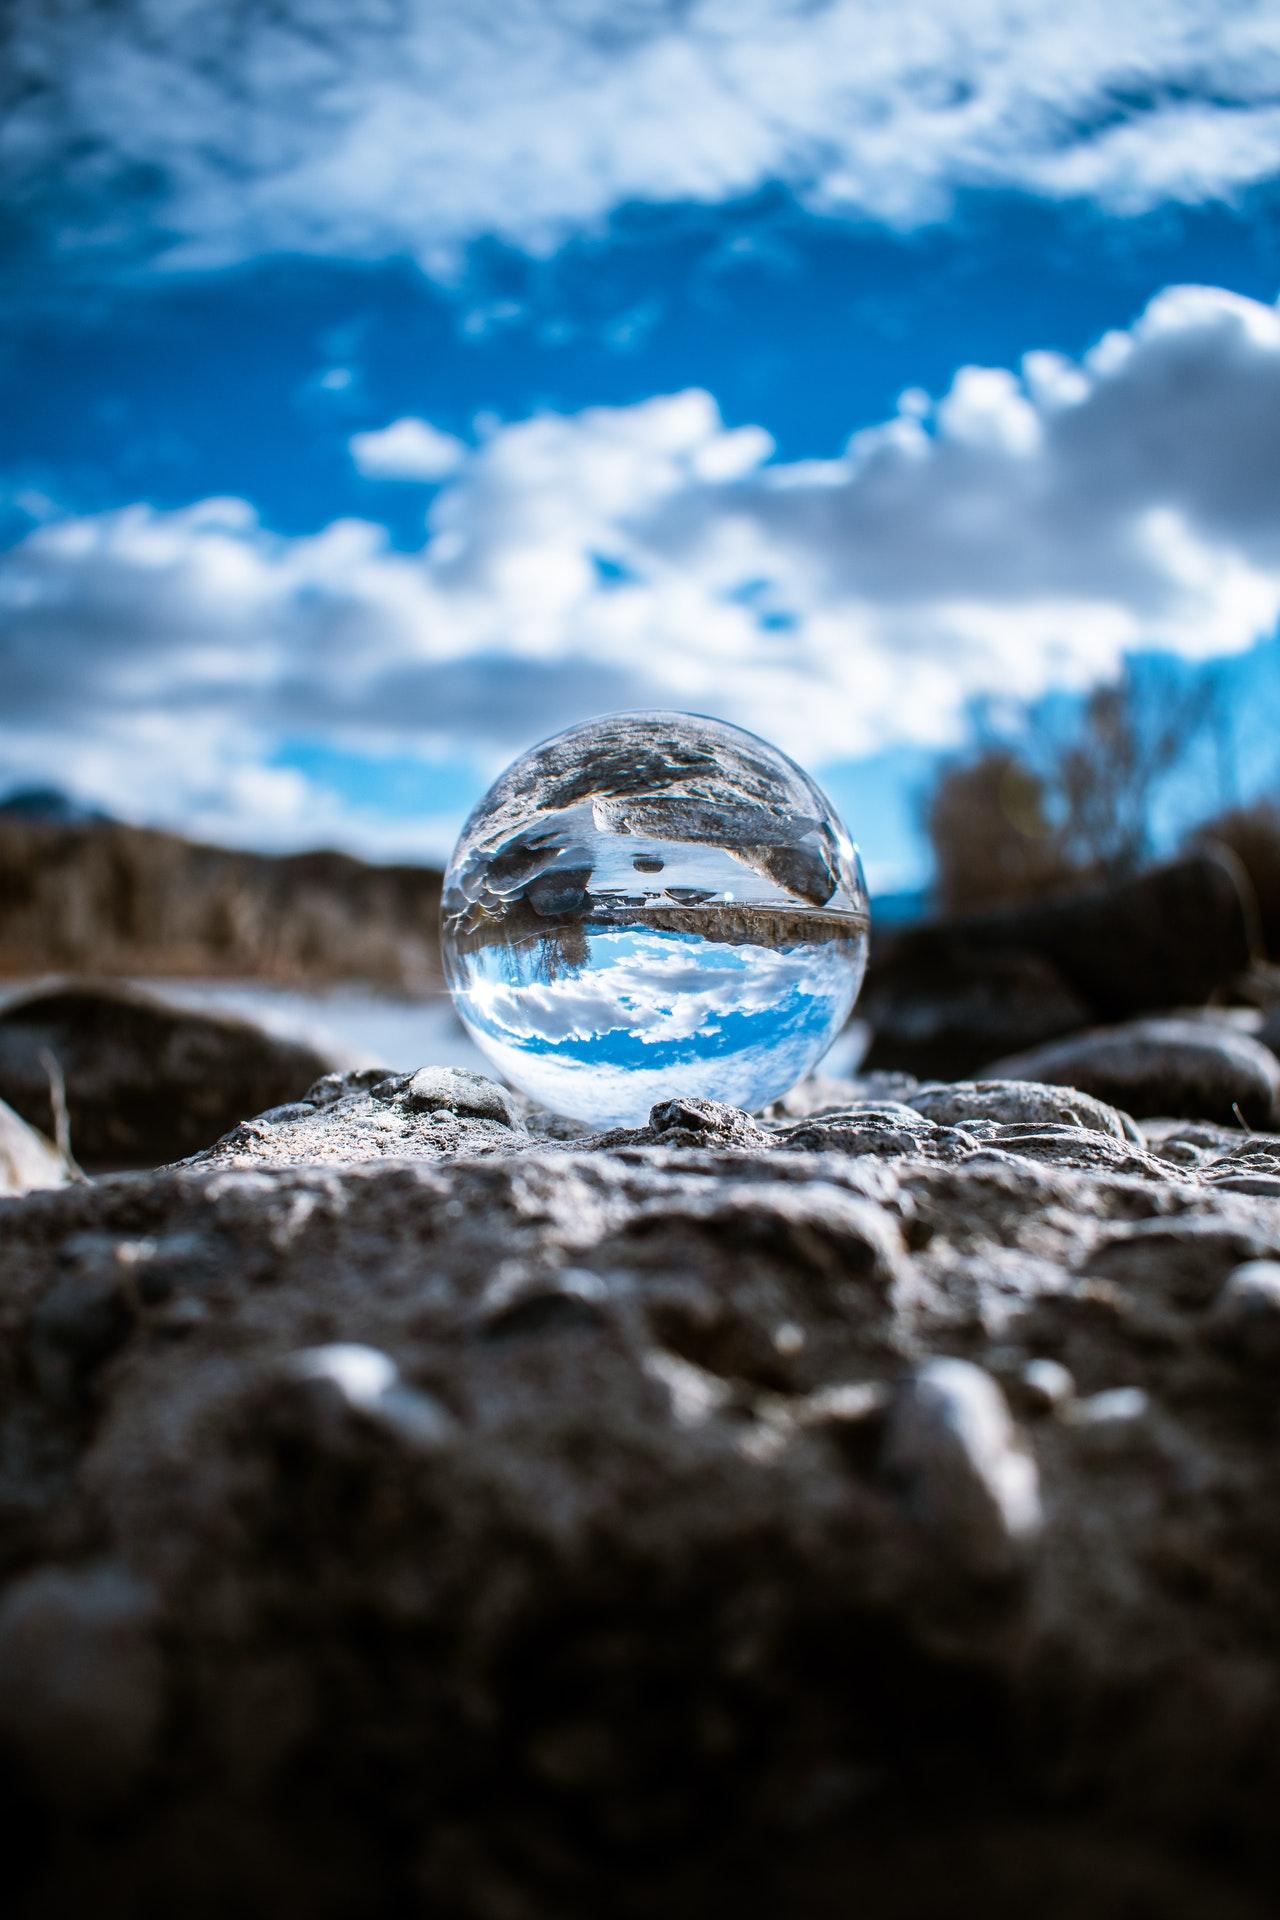 lensball on gray stone